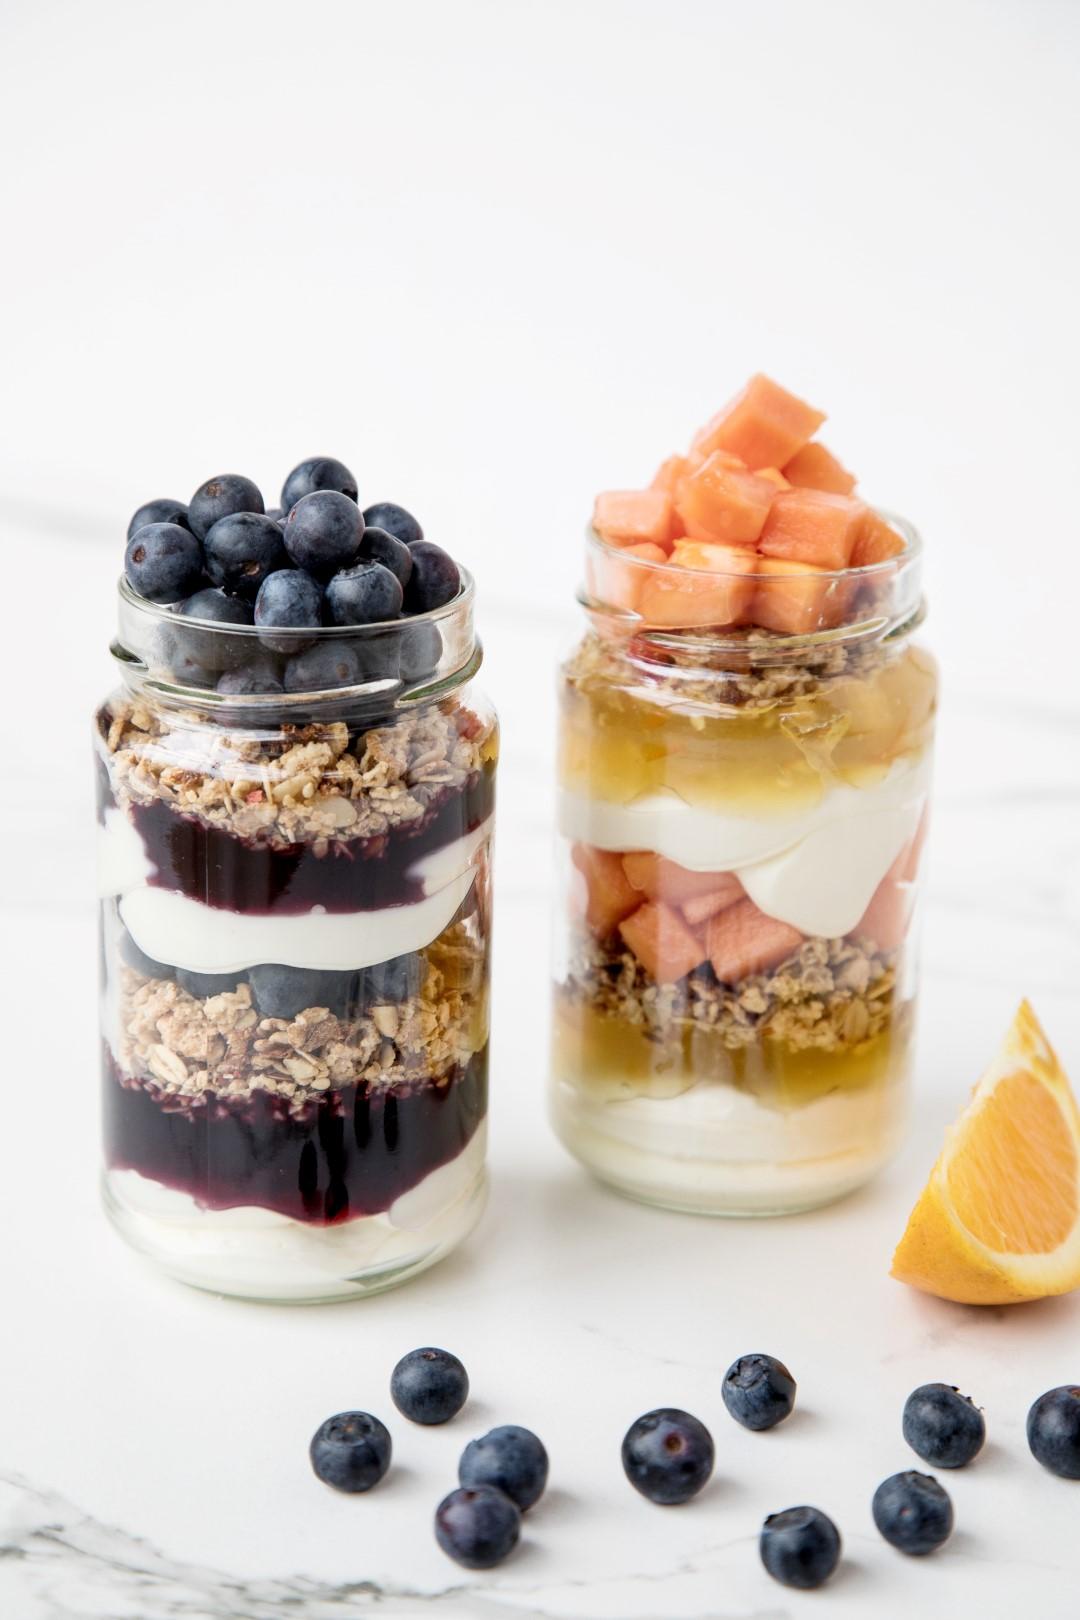 postre trifle, variantes, mermelada Los Nietitos, recetas de cocina, postres light, recetas de postres.